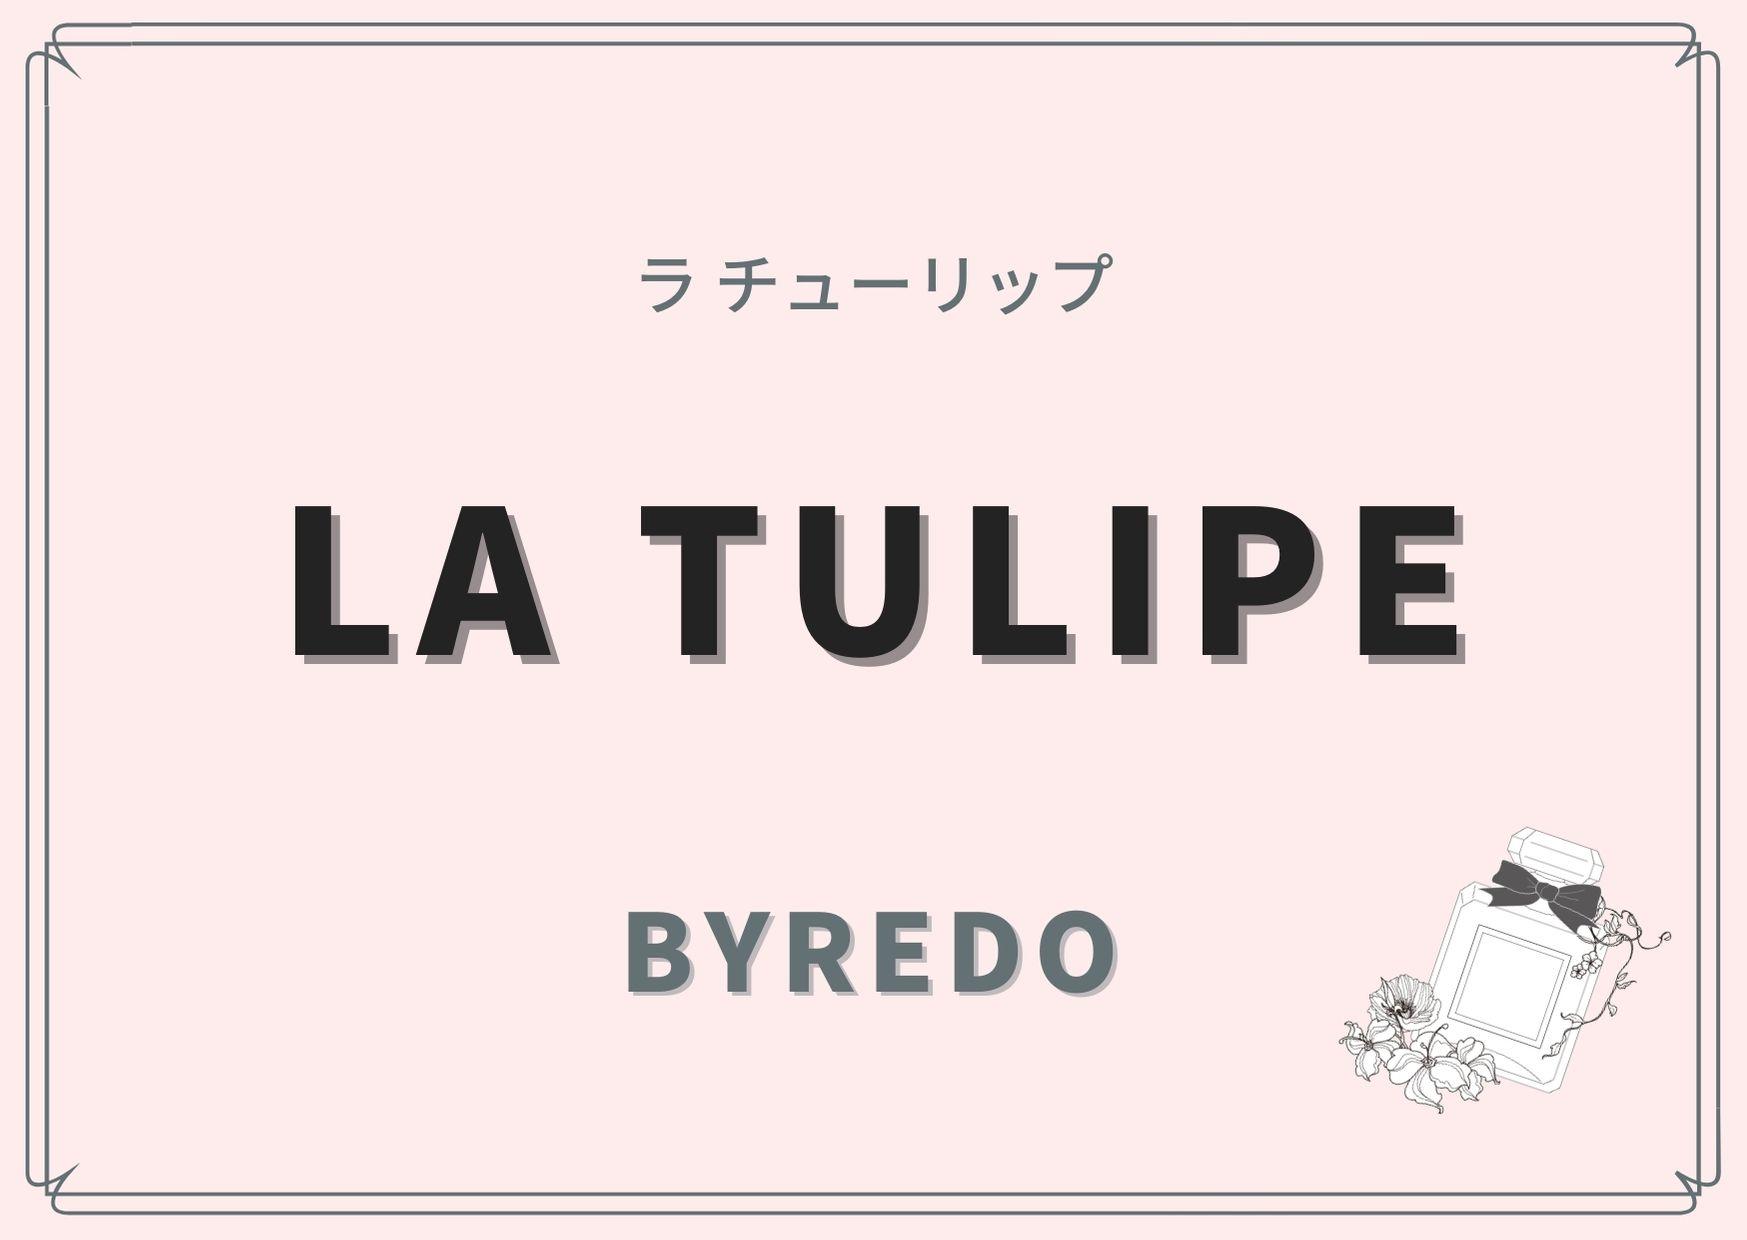 LA TULIPE(ラ チューリップ)/ BYREDO(バイレード)